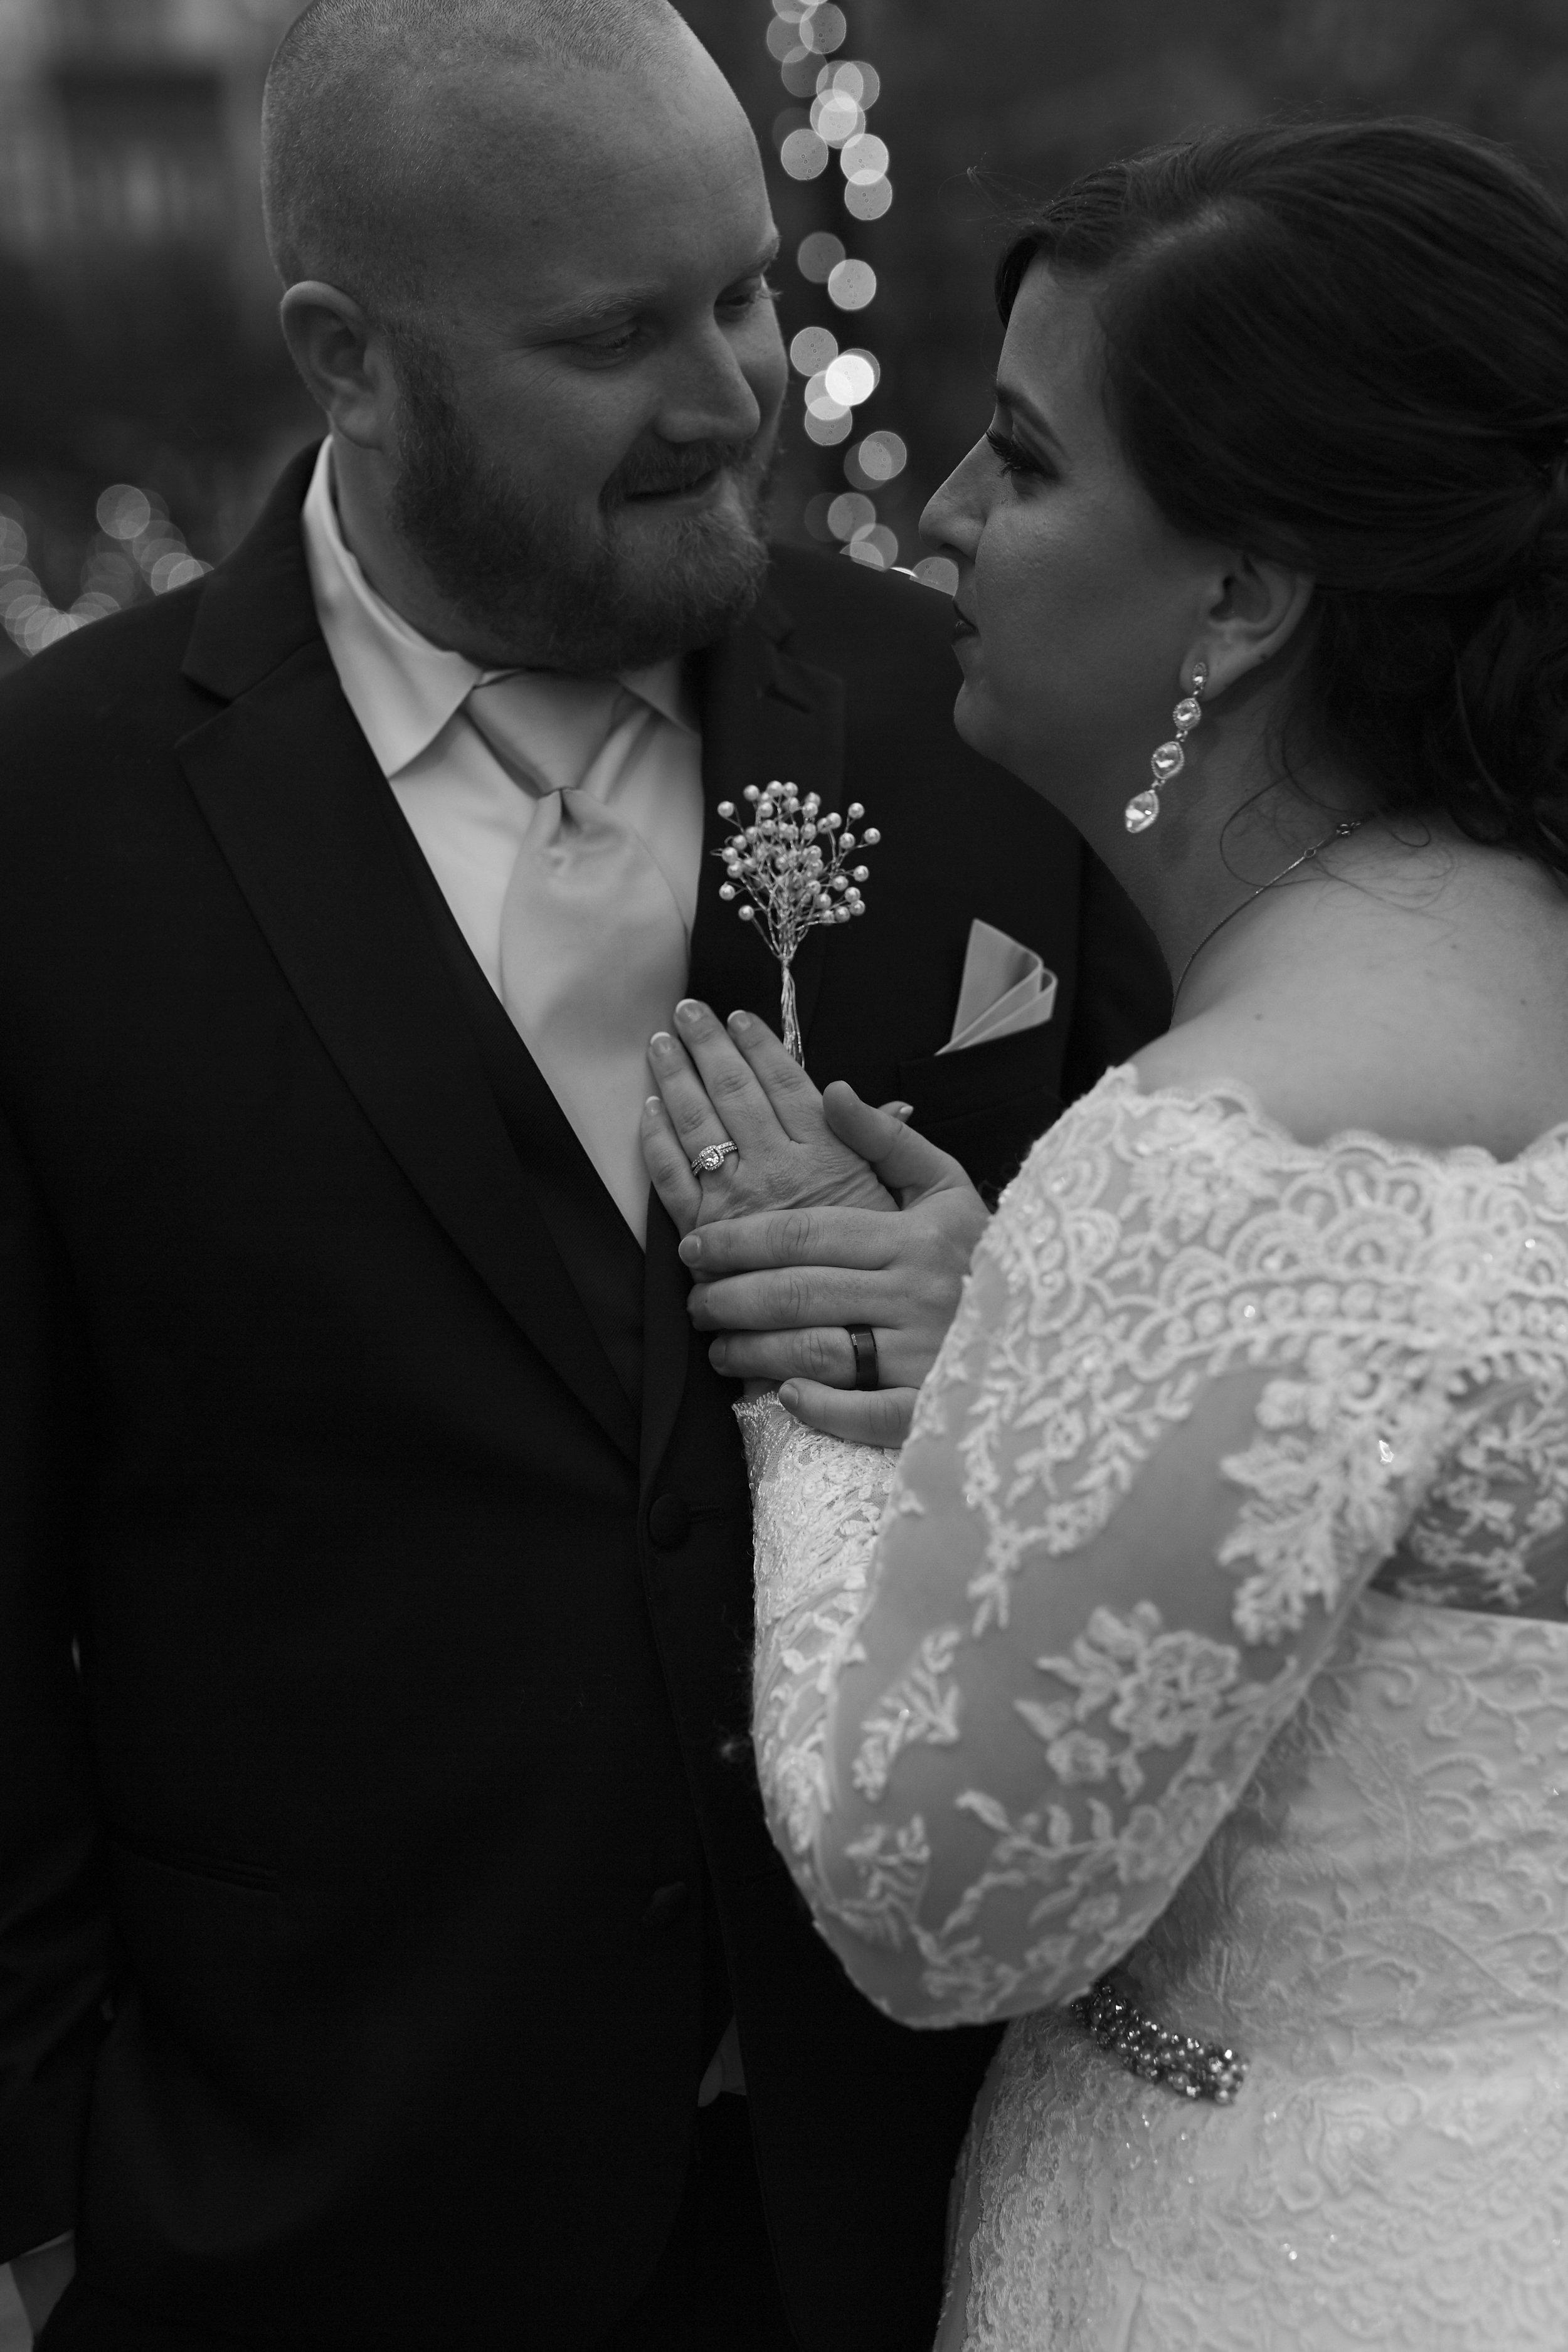 Liz & Josh Wedding -  benromangphoto - 6I5A0817.jpg